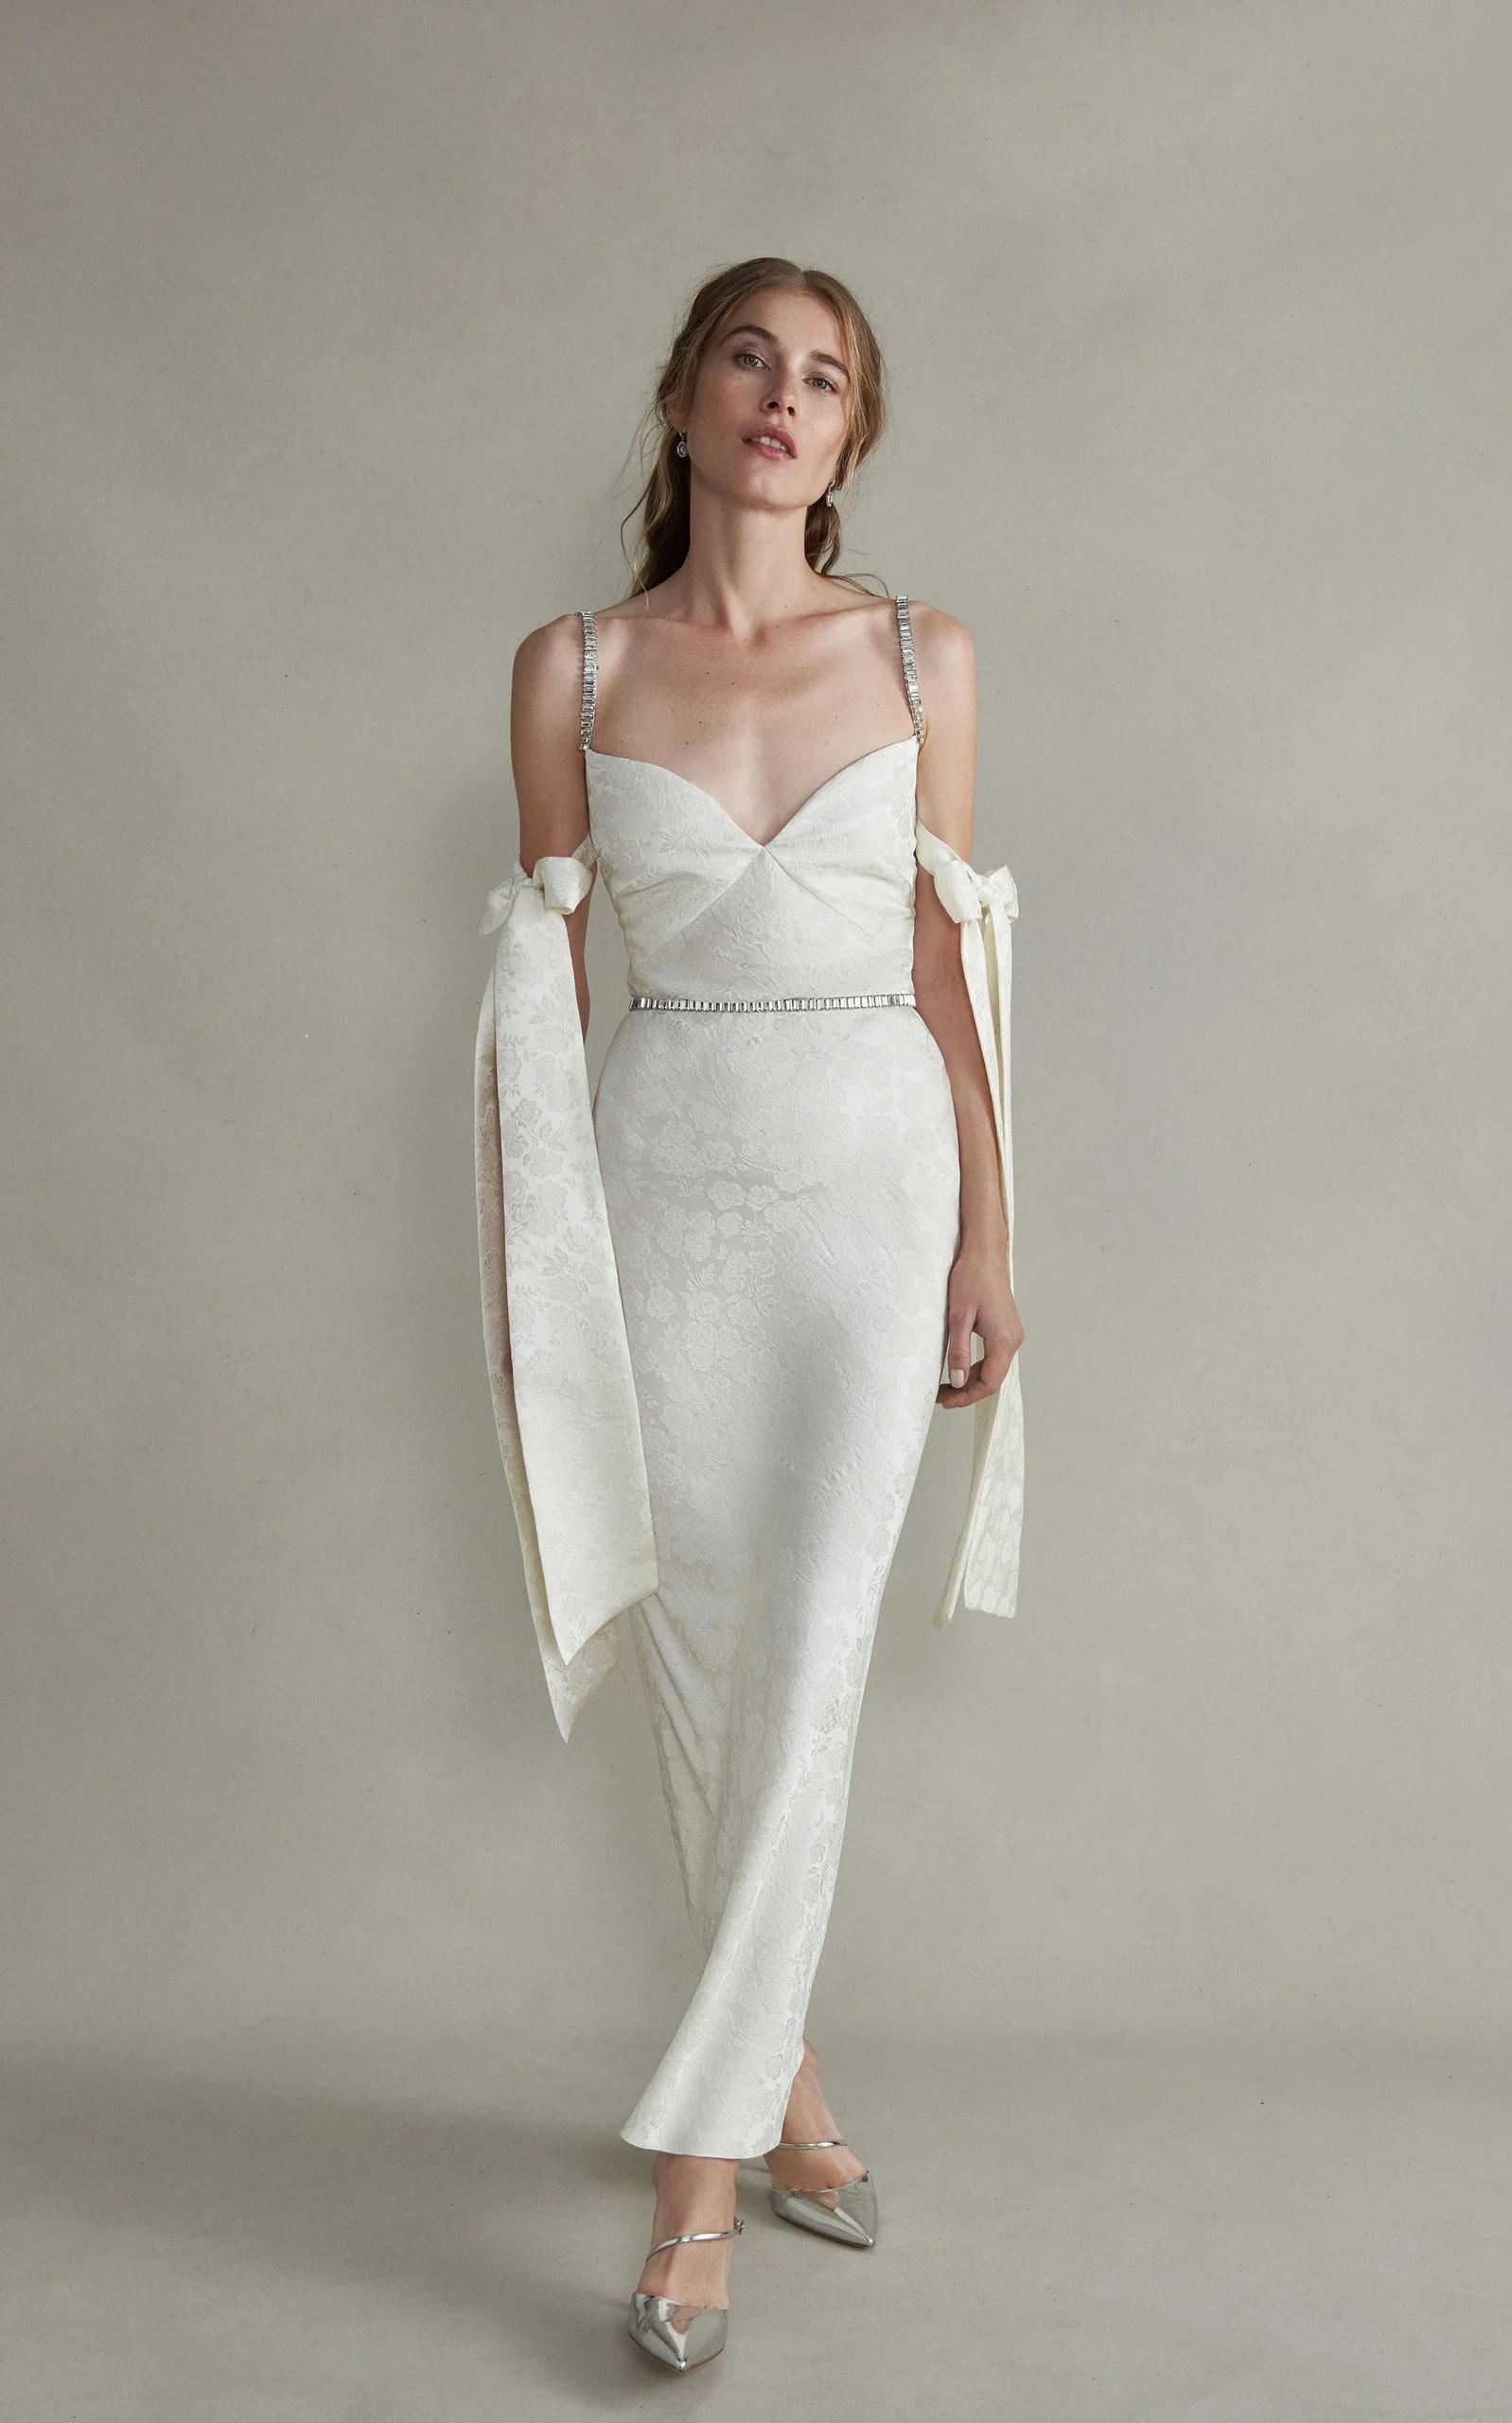 Markarian - Rhett Jeweled Cami Strap Dress With Arm Bow Detail